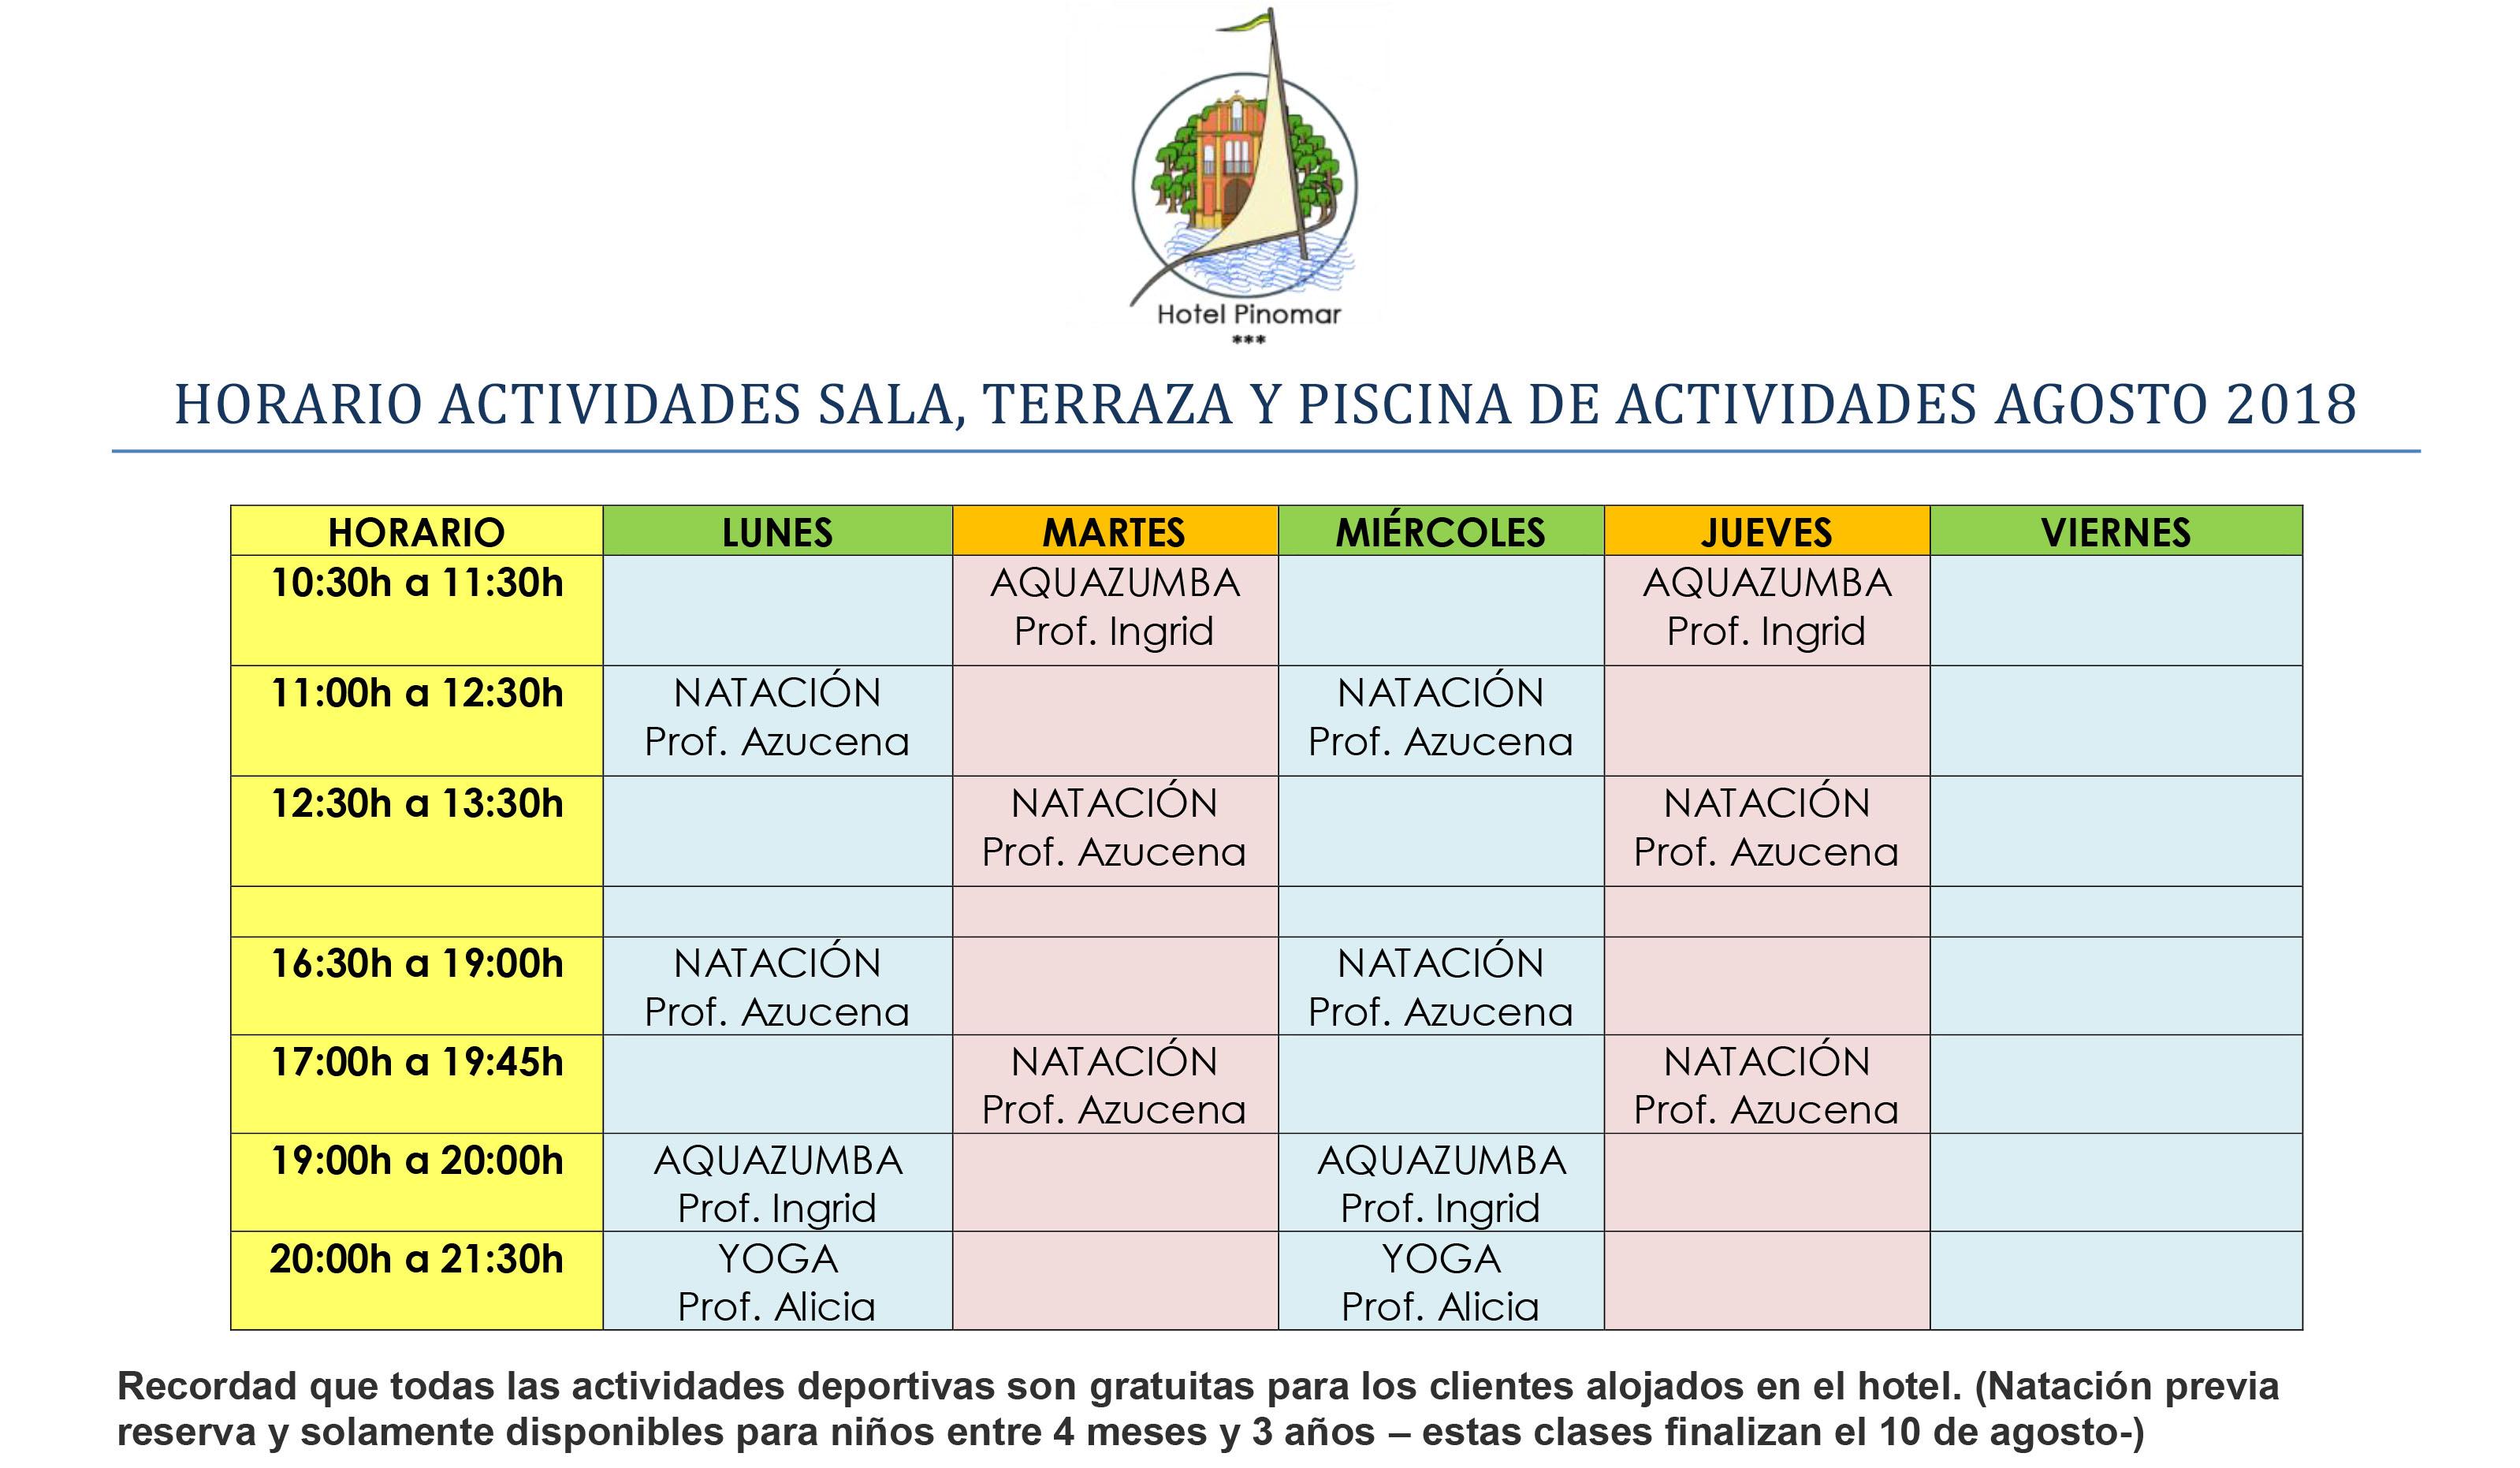 HORARIO ACTIVIDADES DIRIGIDAS AGOSTO 2018